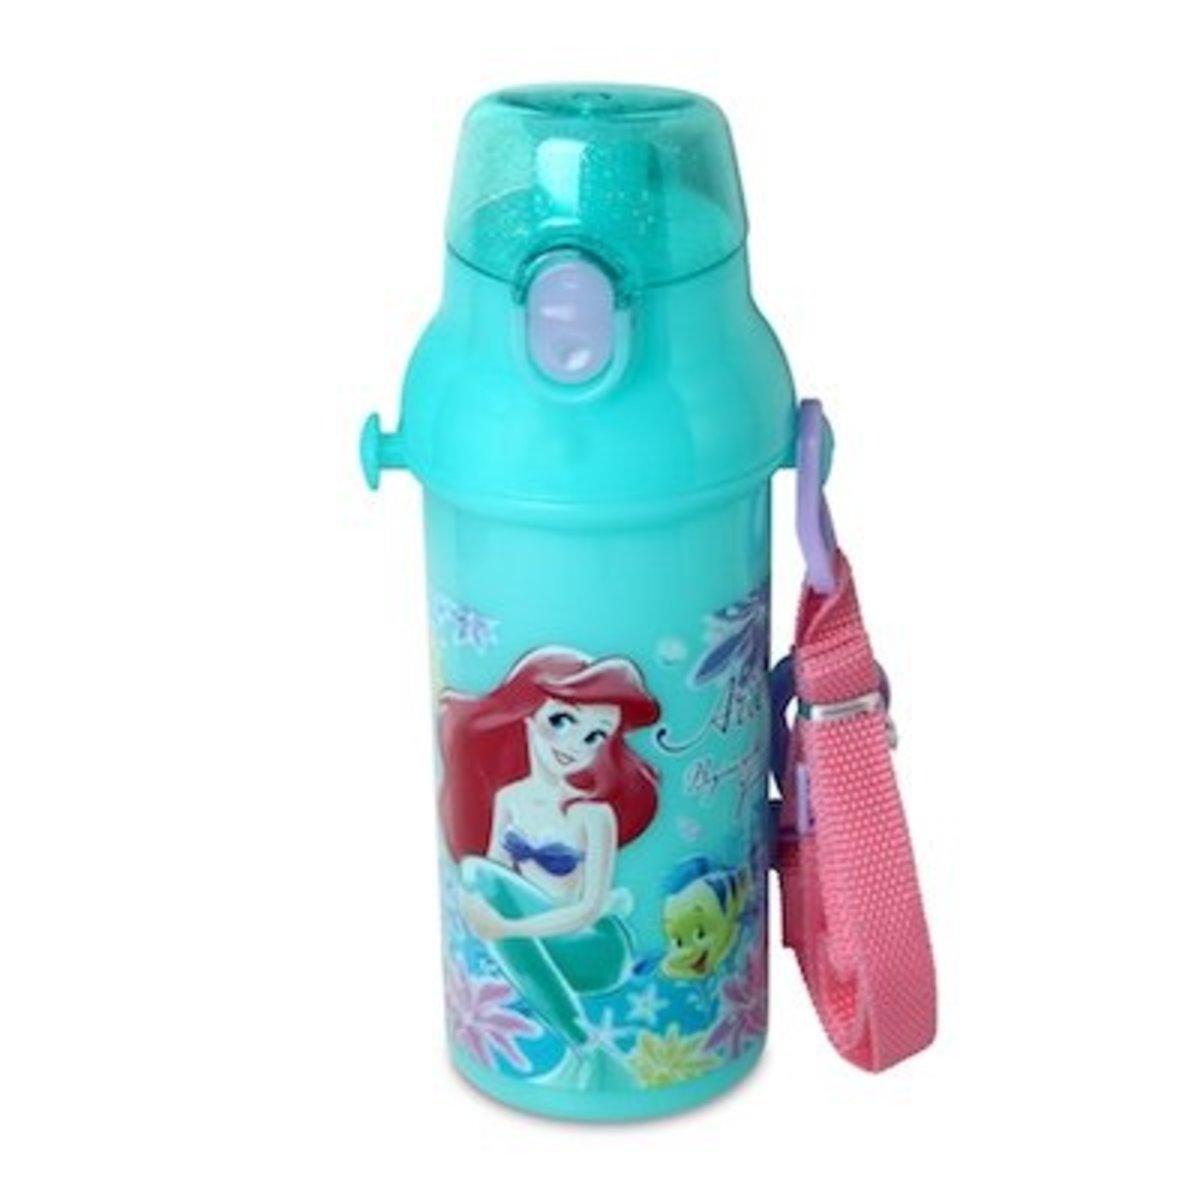 Disney Little Mermaid Ariel 480ML One Touch Bottle [Licensed by Disney]